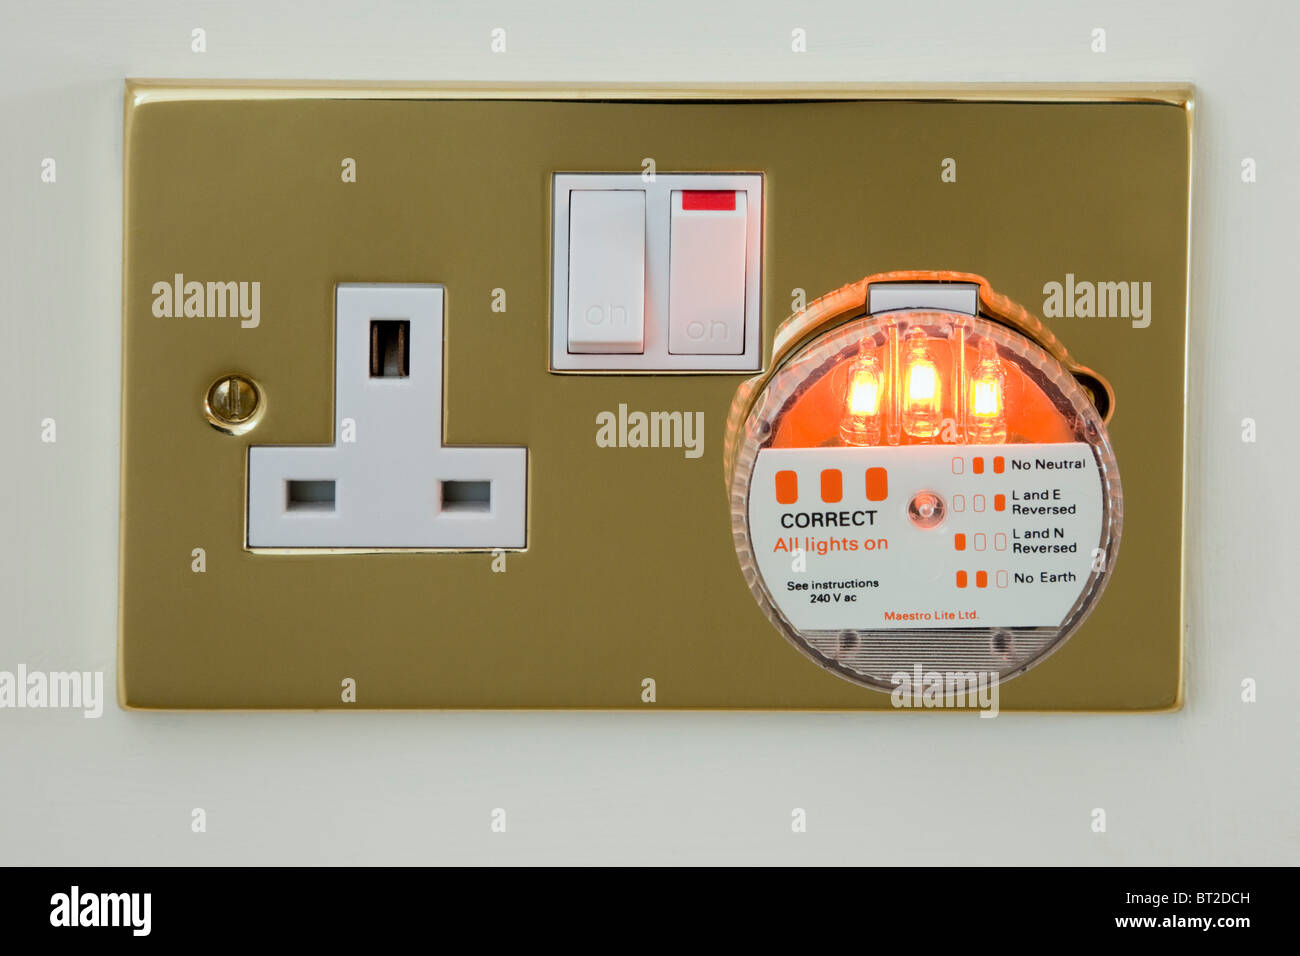 Mains Voltage Detector